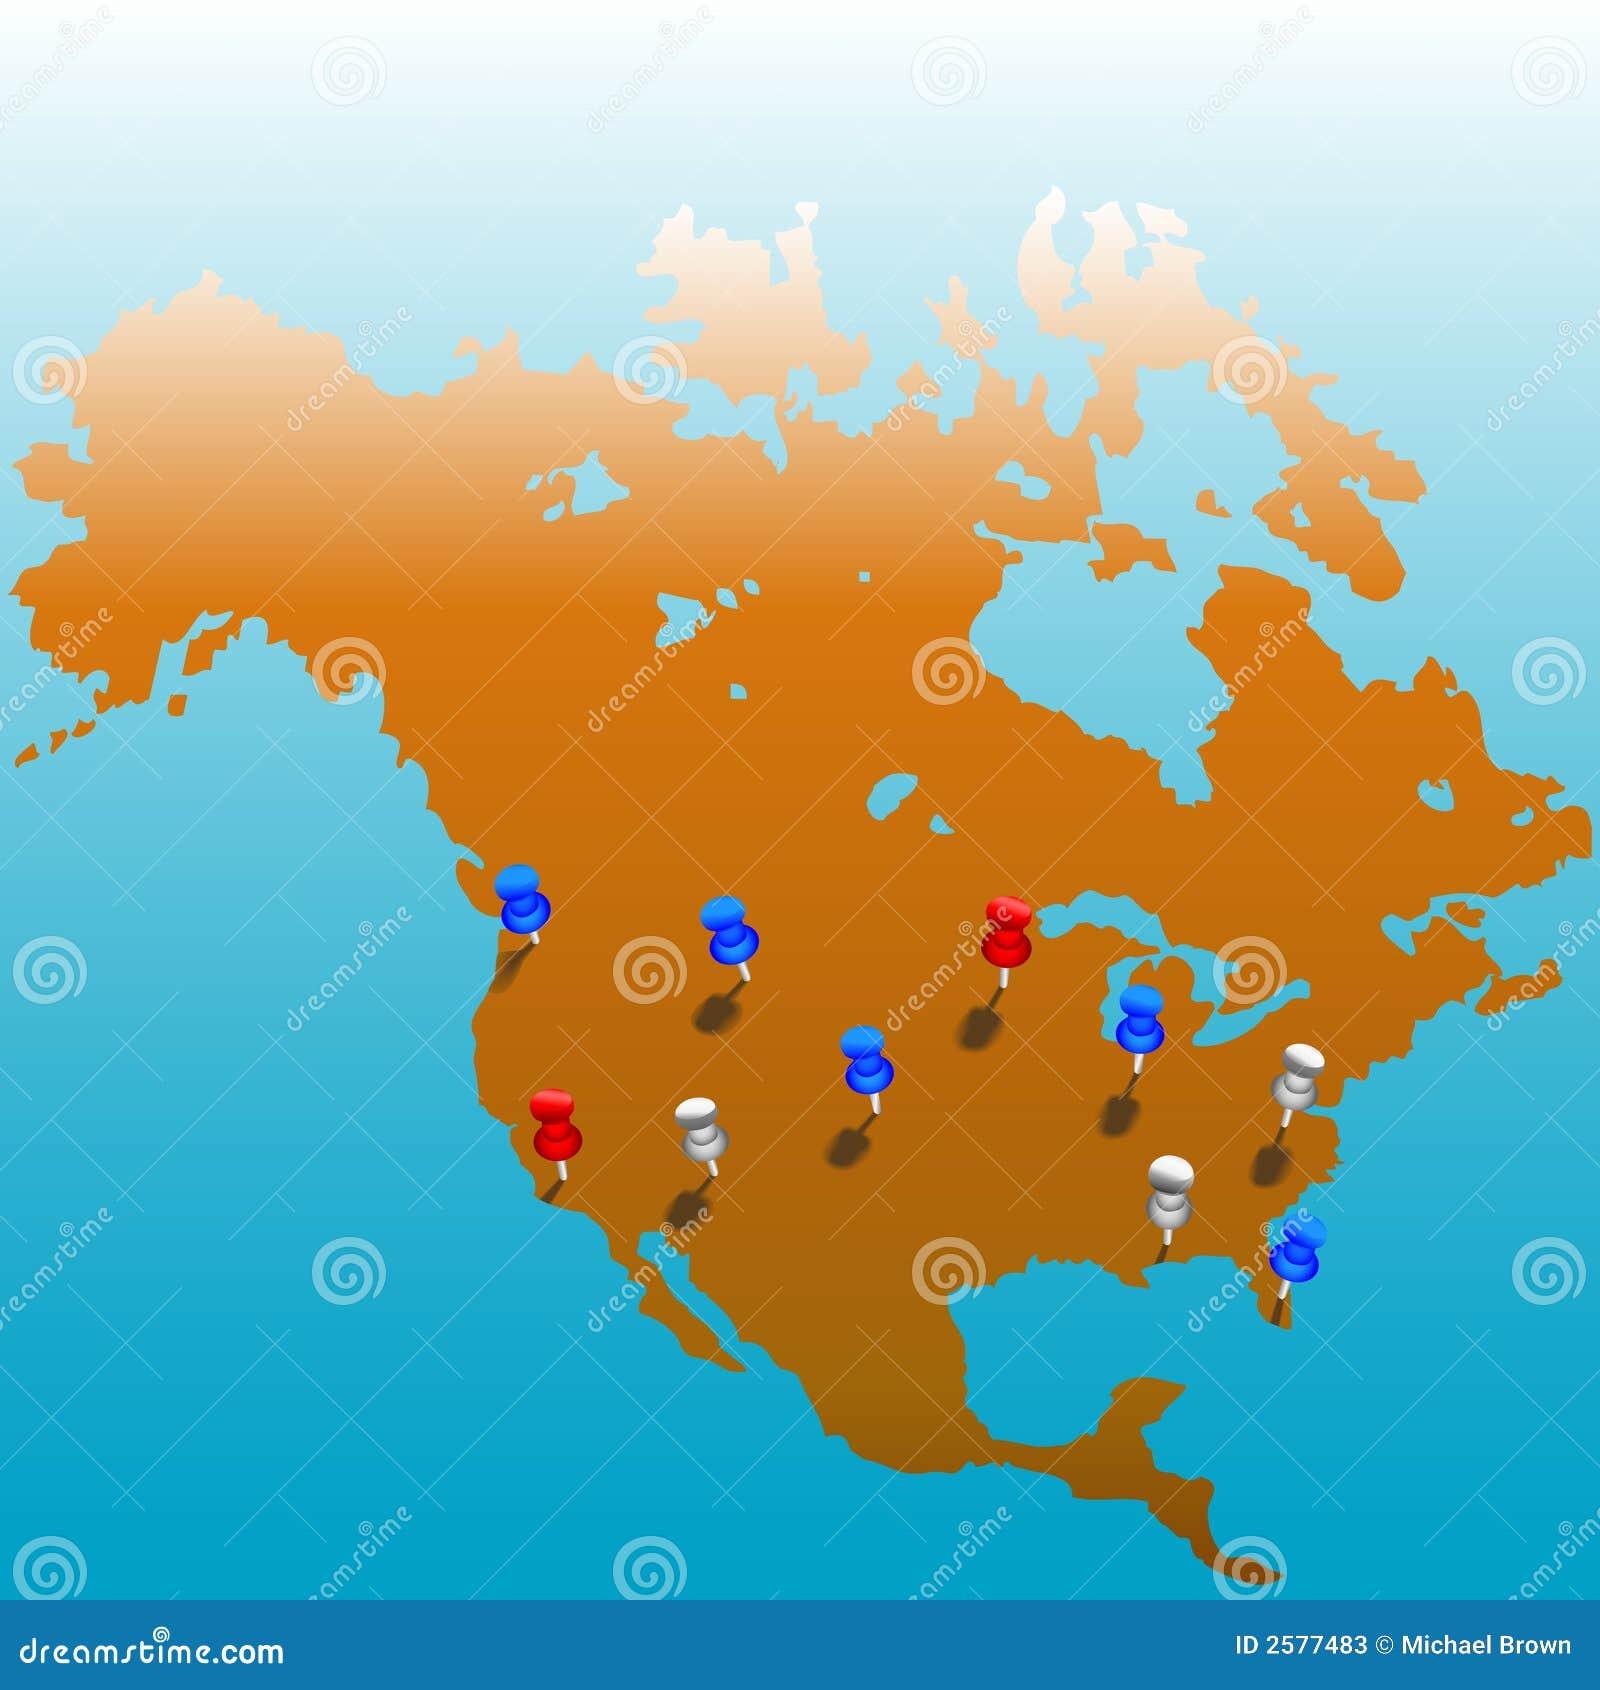 World Wide Tacks US Map Stock Photos Image 2577483